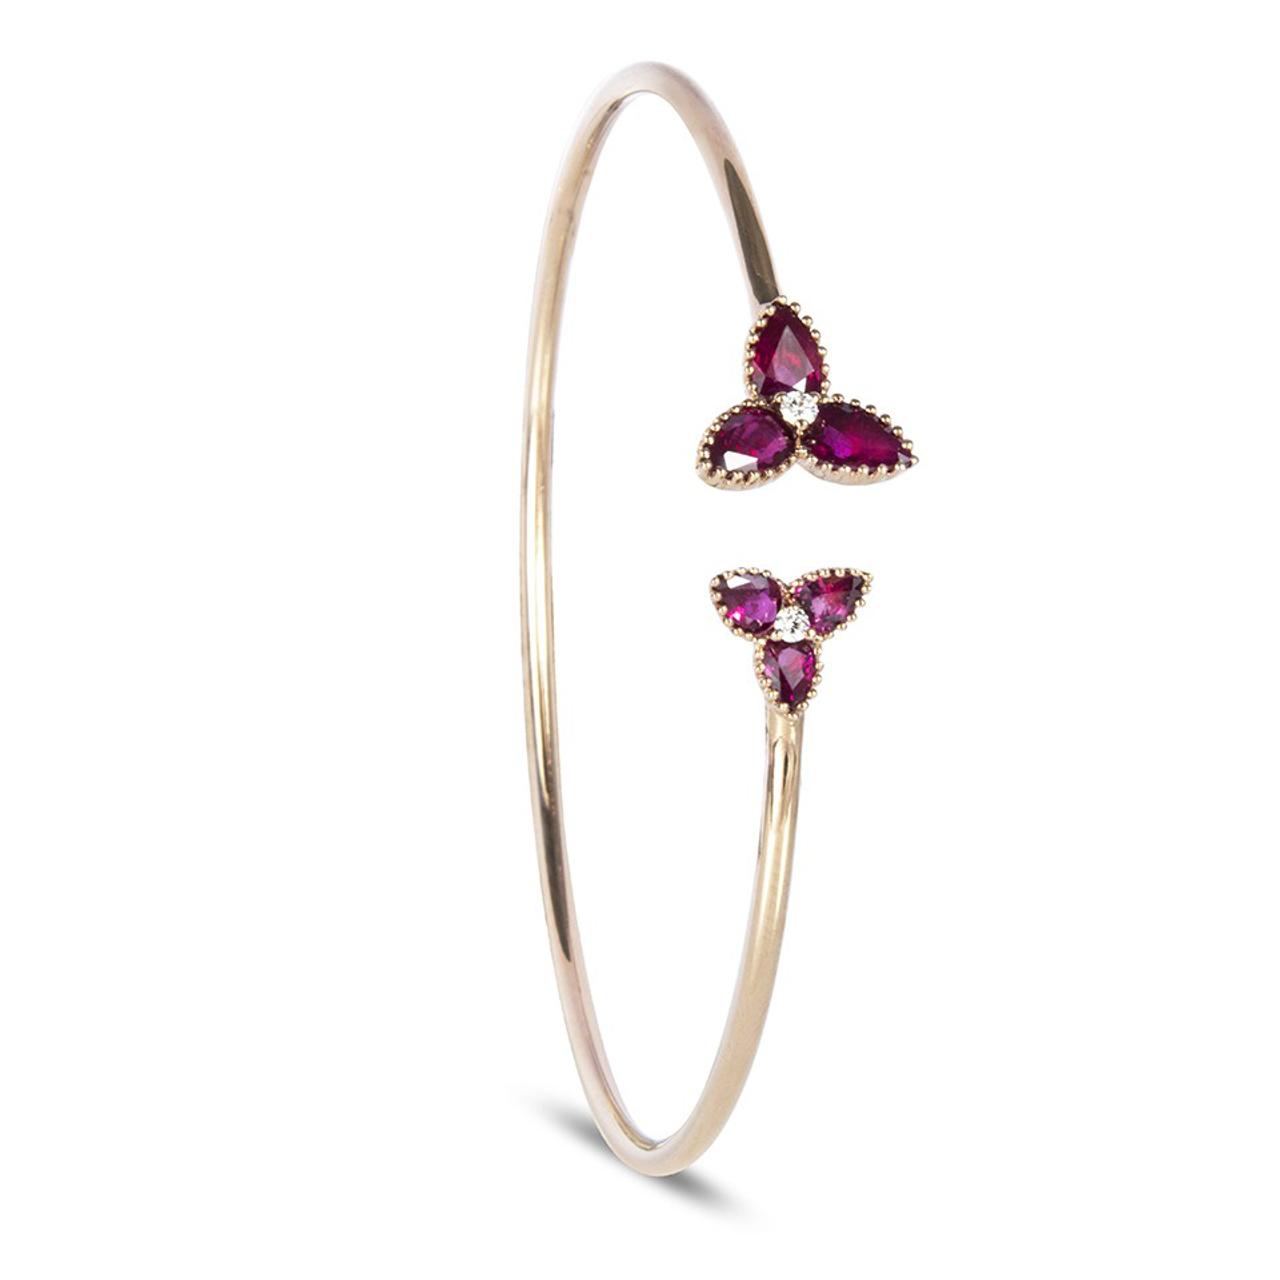 18ct Rose Gold Ruby & Diamond Trefoil bangle